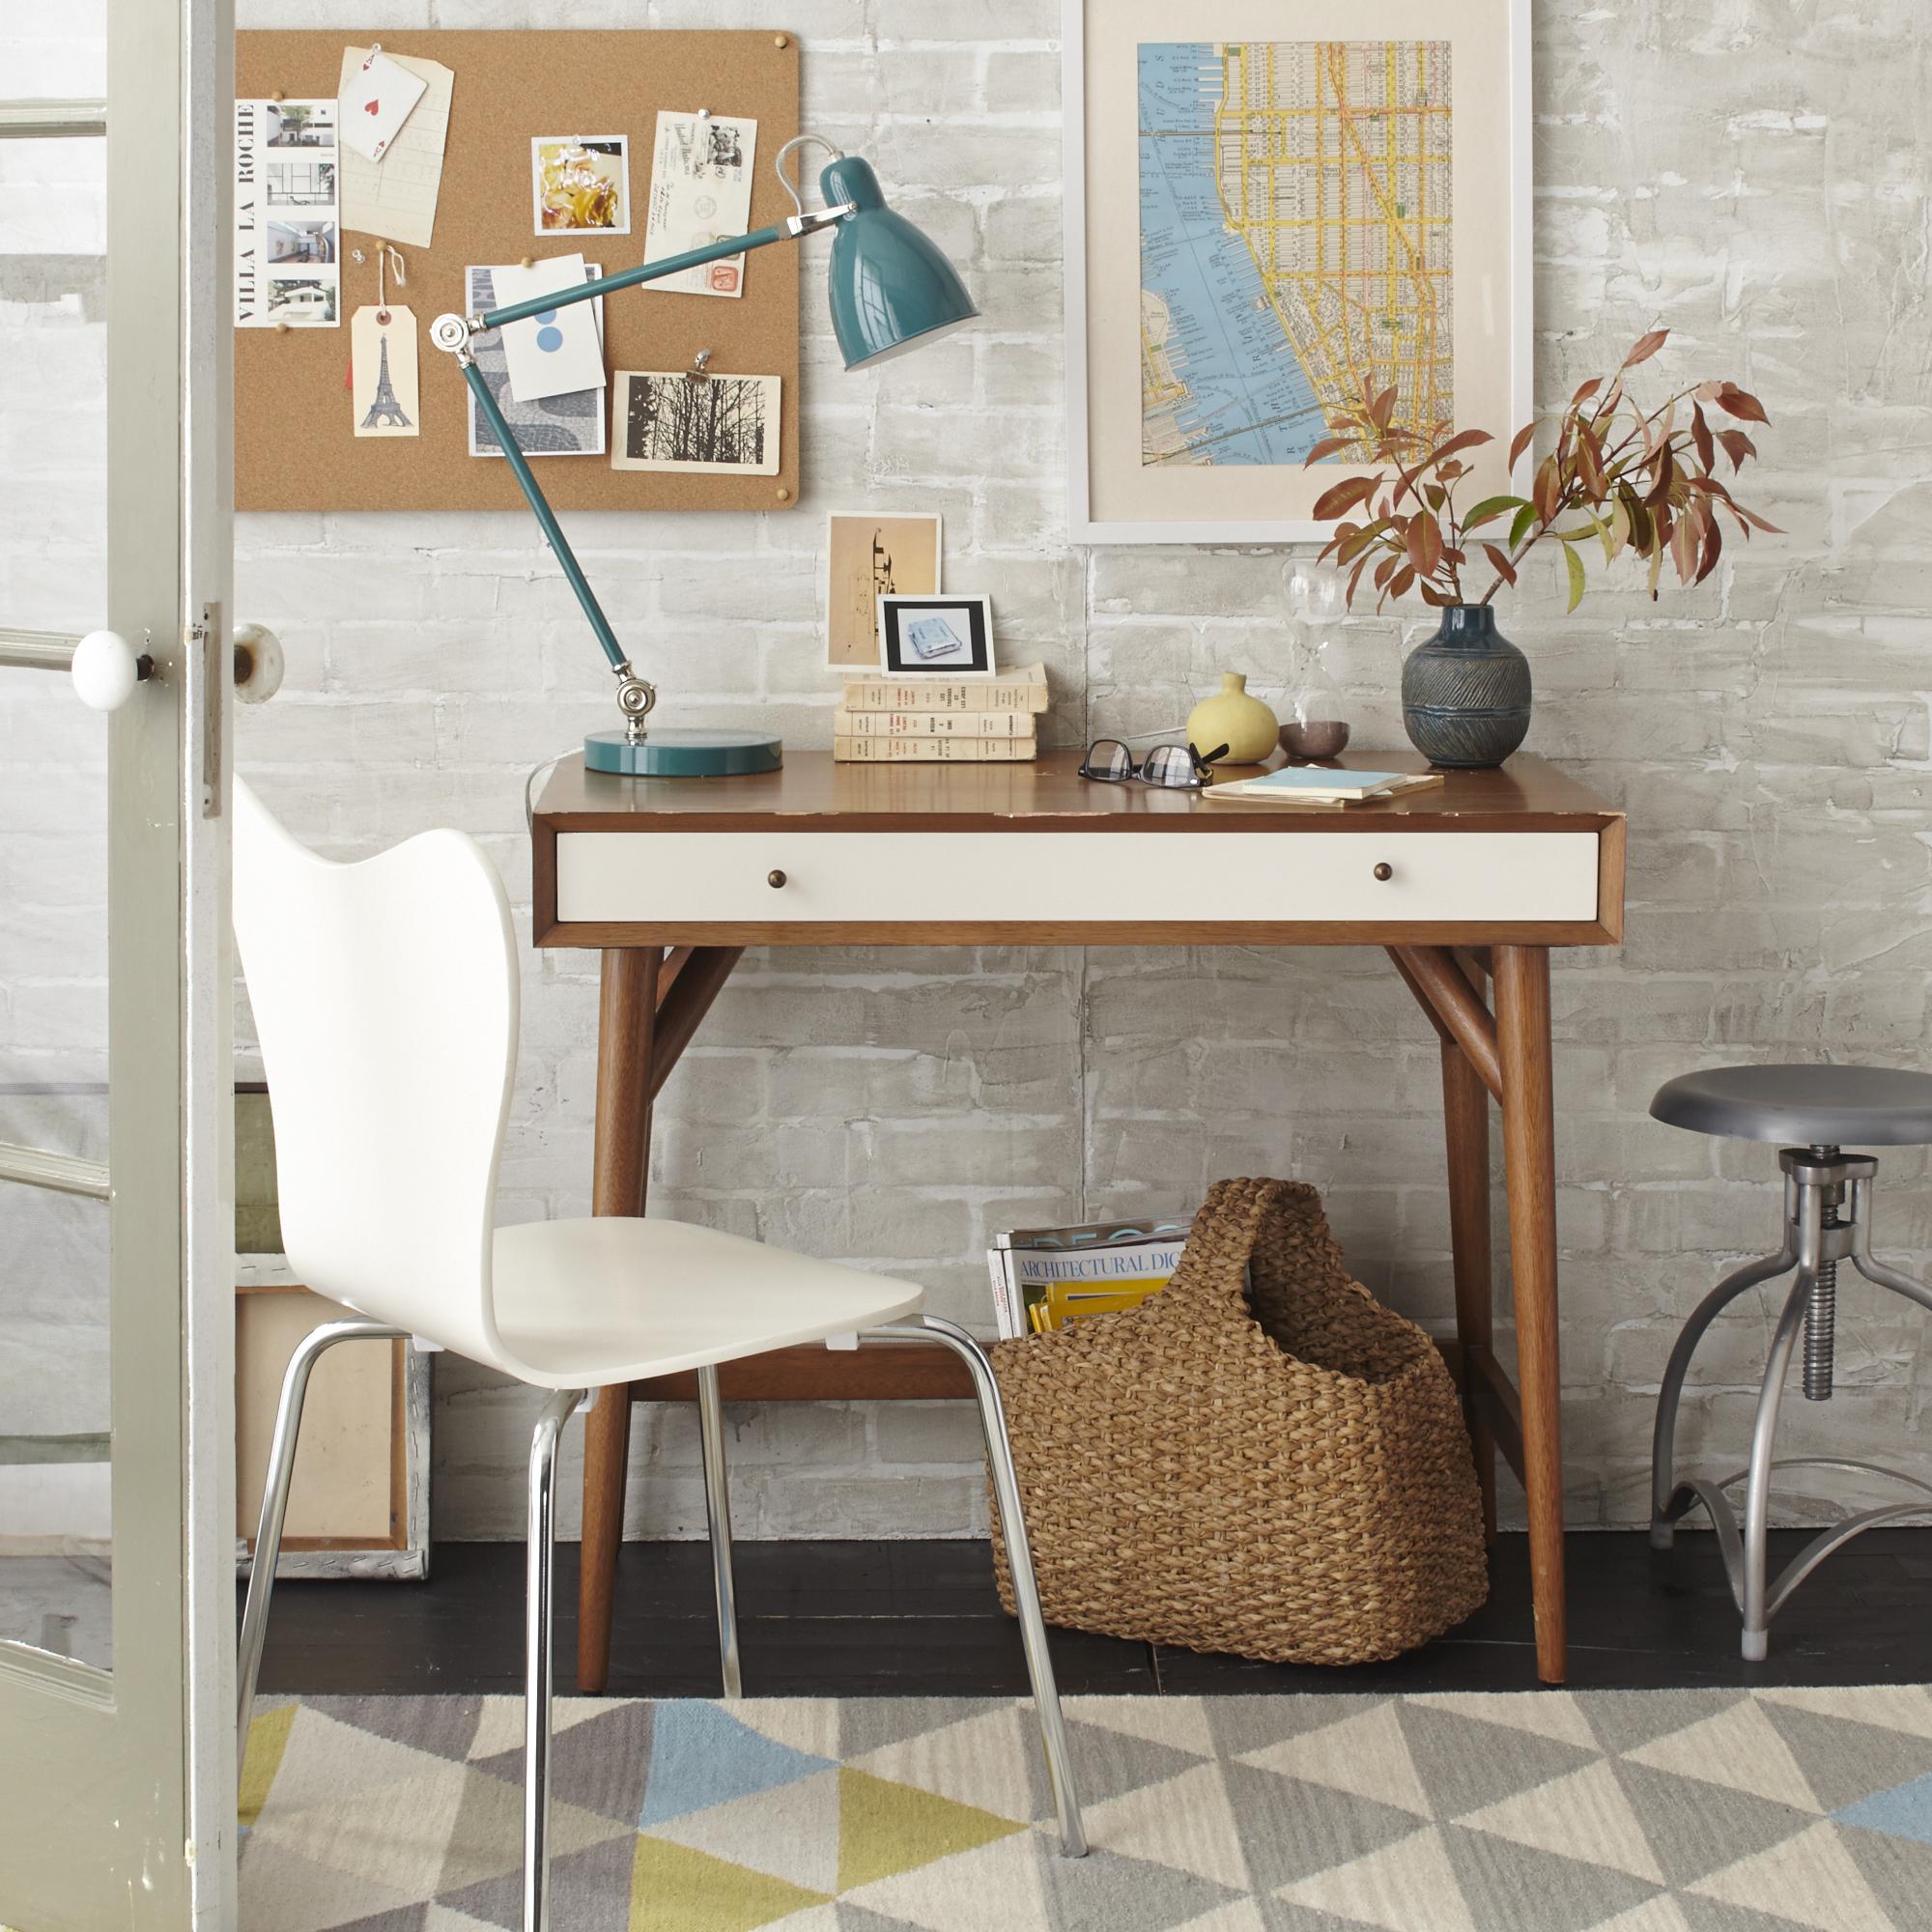 pip-mid-century-mini-desk-acorn-fa14-093.jpg